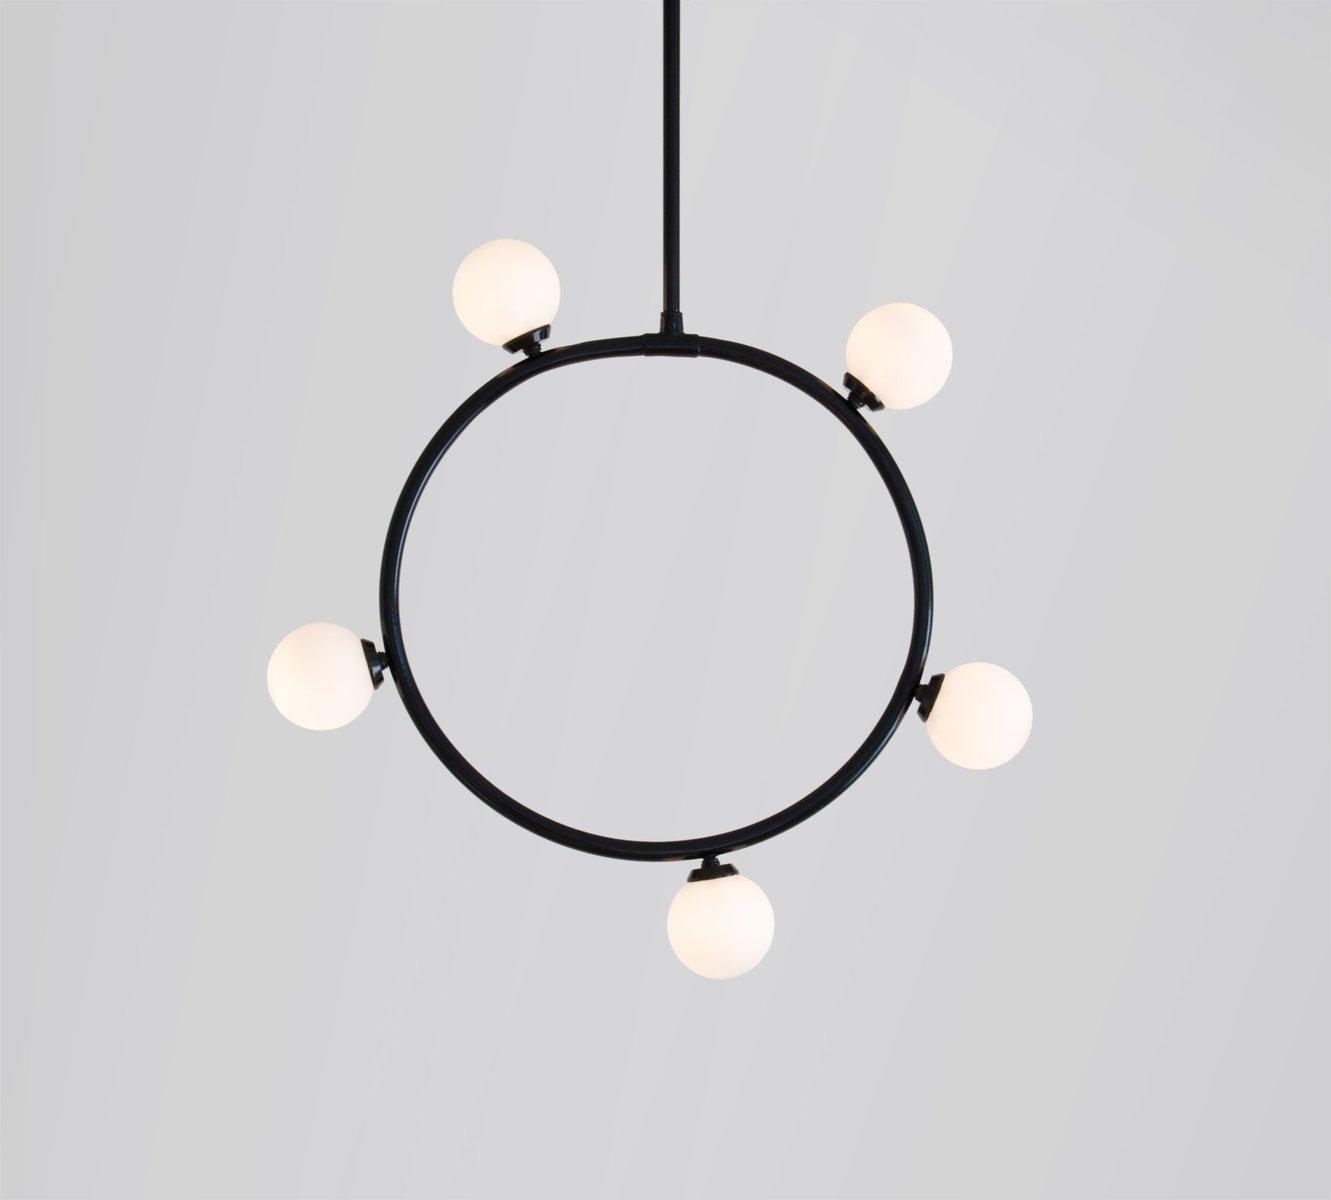 Circle and Spheres Deckenlampe von Atelier Areti